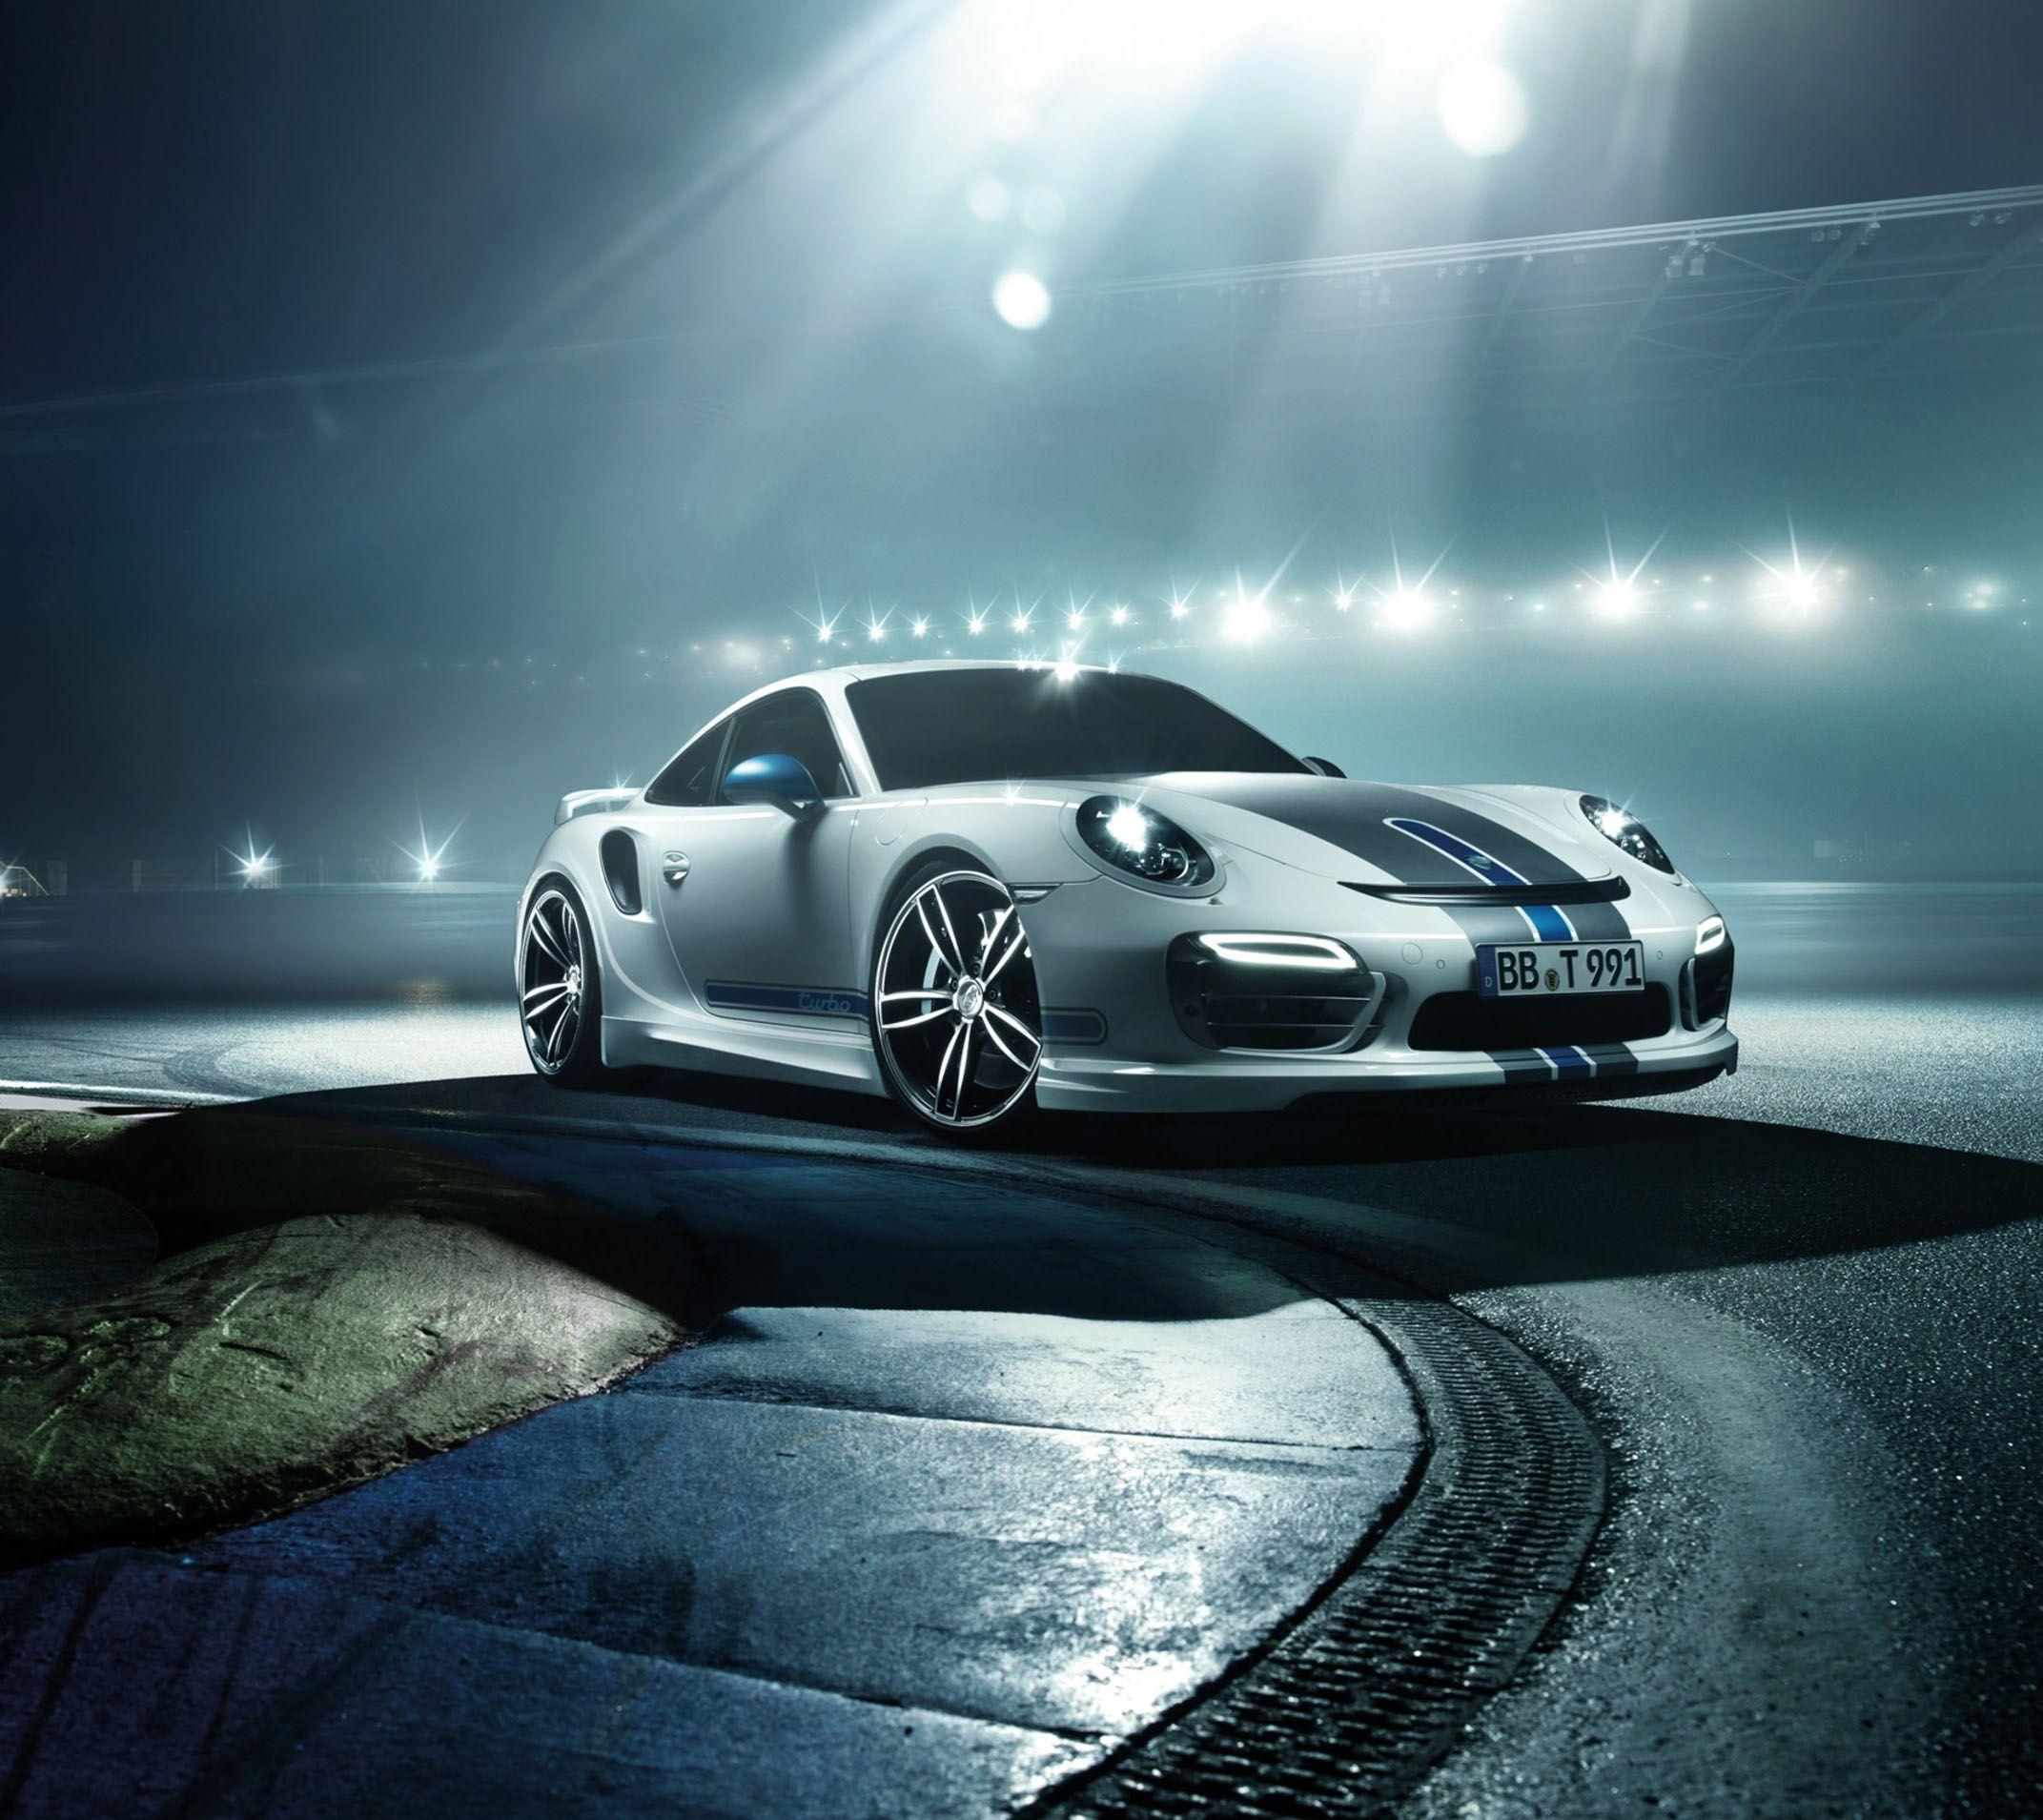 3 Of The Most Iconic Porsche Models Porsche 911 Turbo Porsche Models Porsche 911